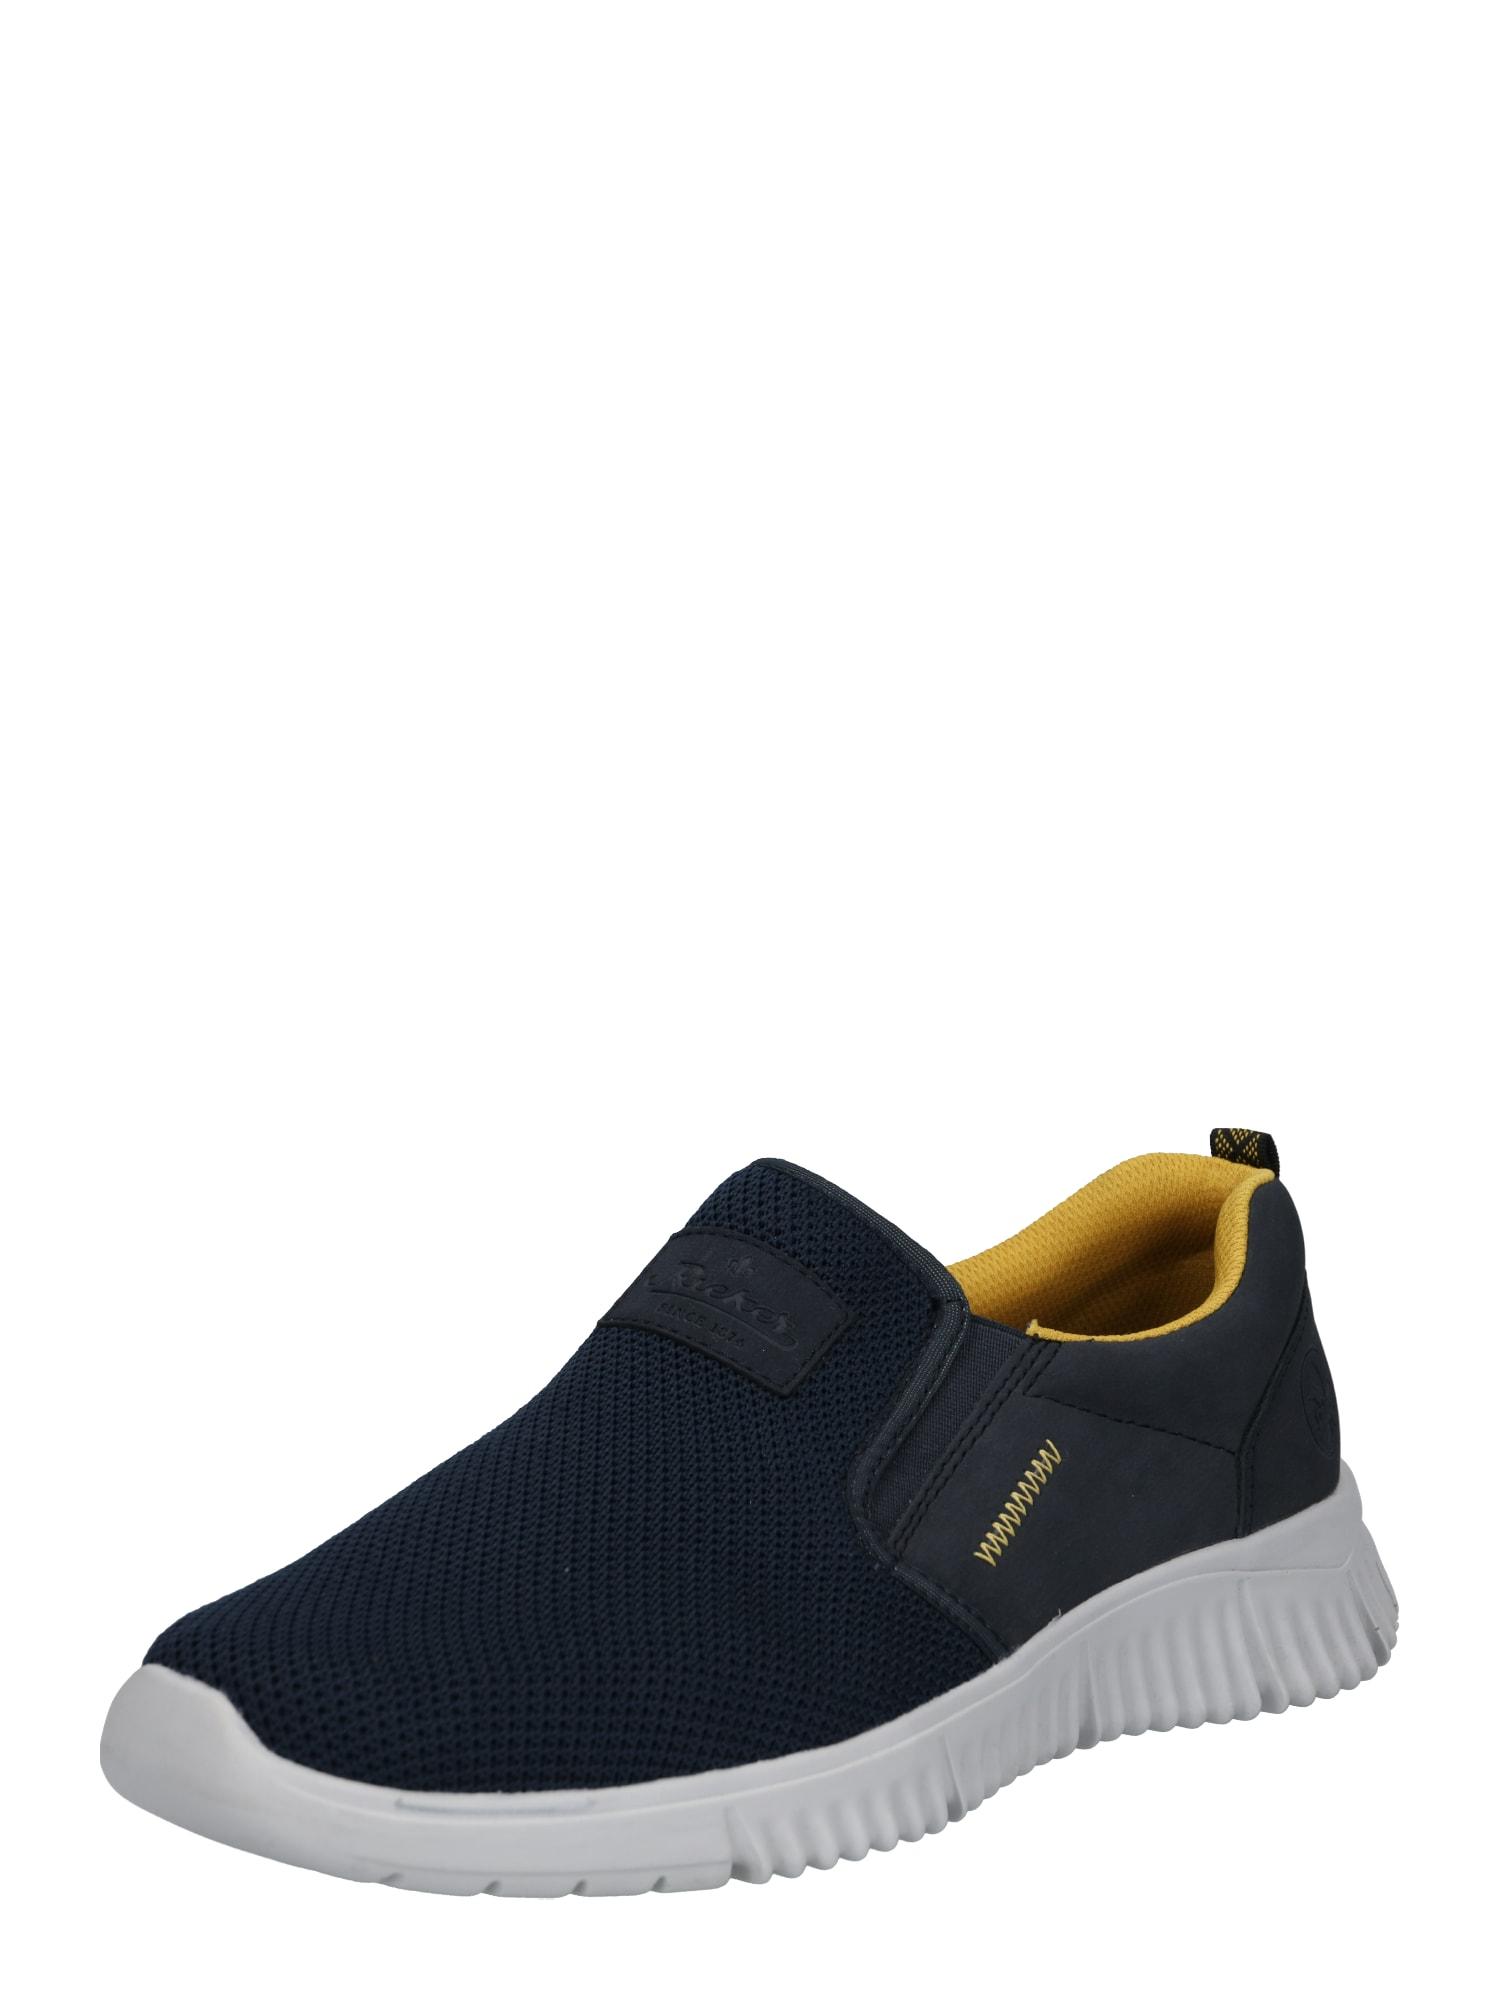 RIEKER Slipper  tmavě modrá / žlutá